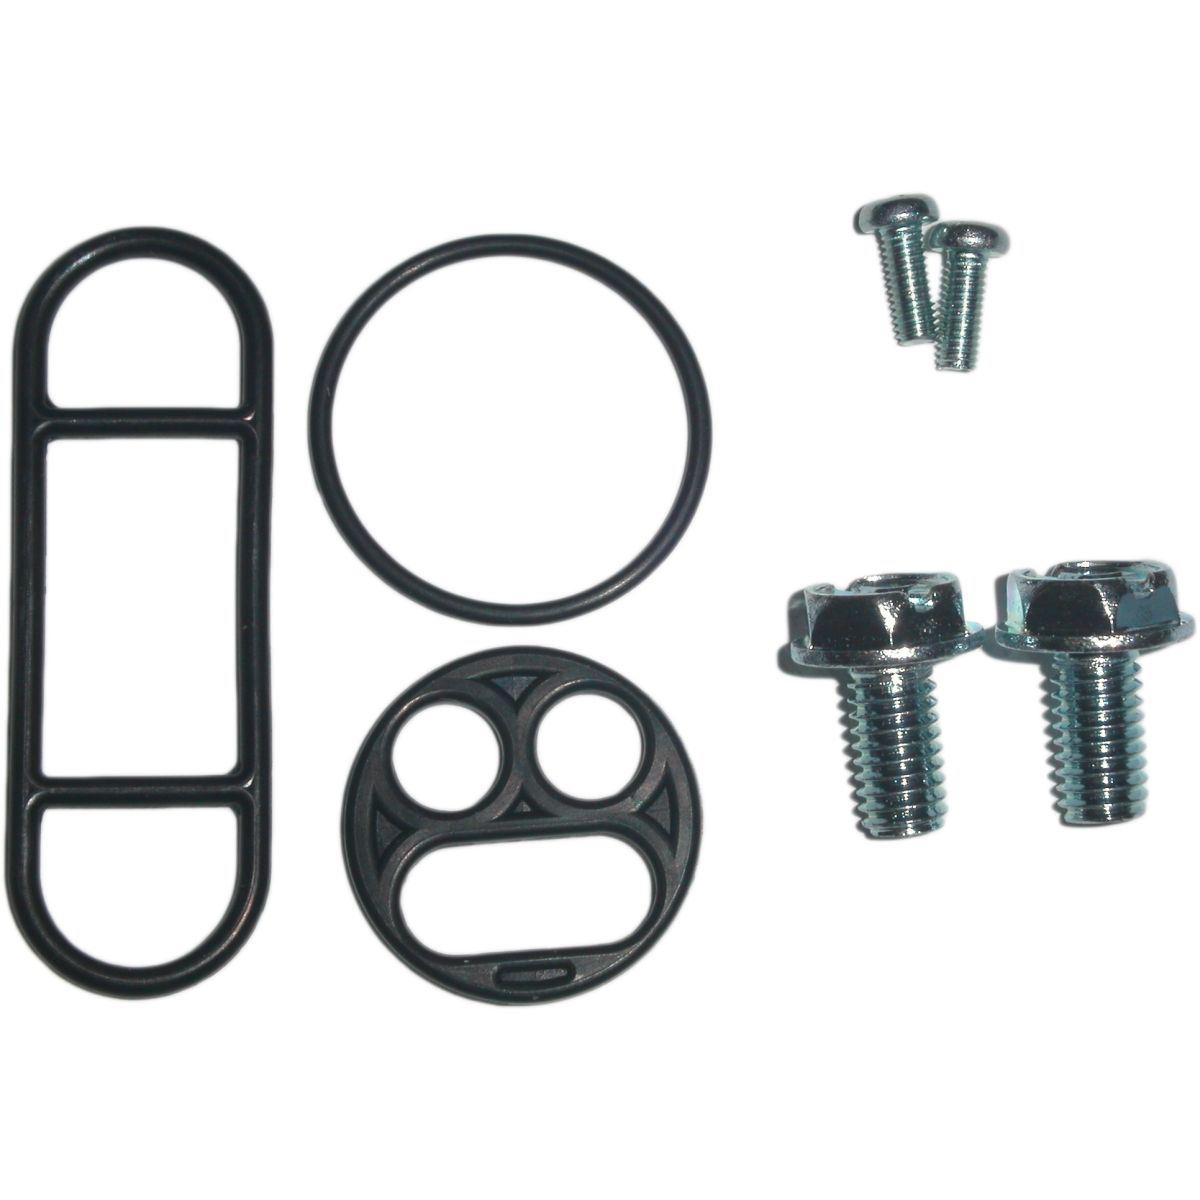 AW Motorcycle Parts. Petrol Tap Repair Kit Kawasaki KX's